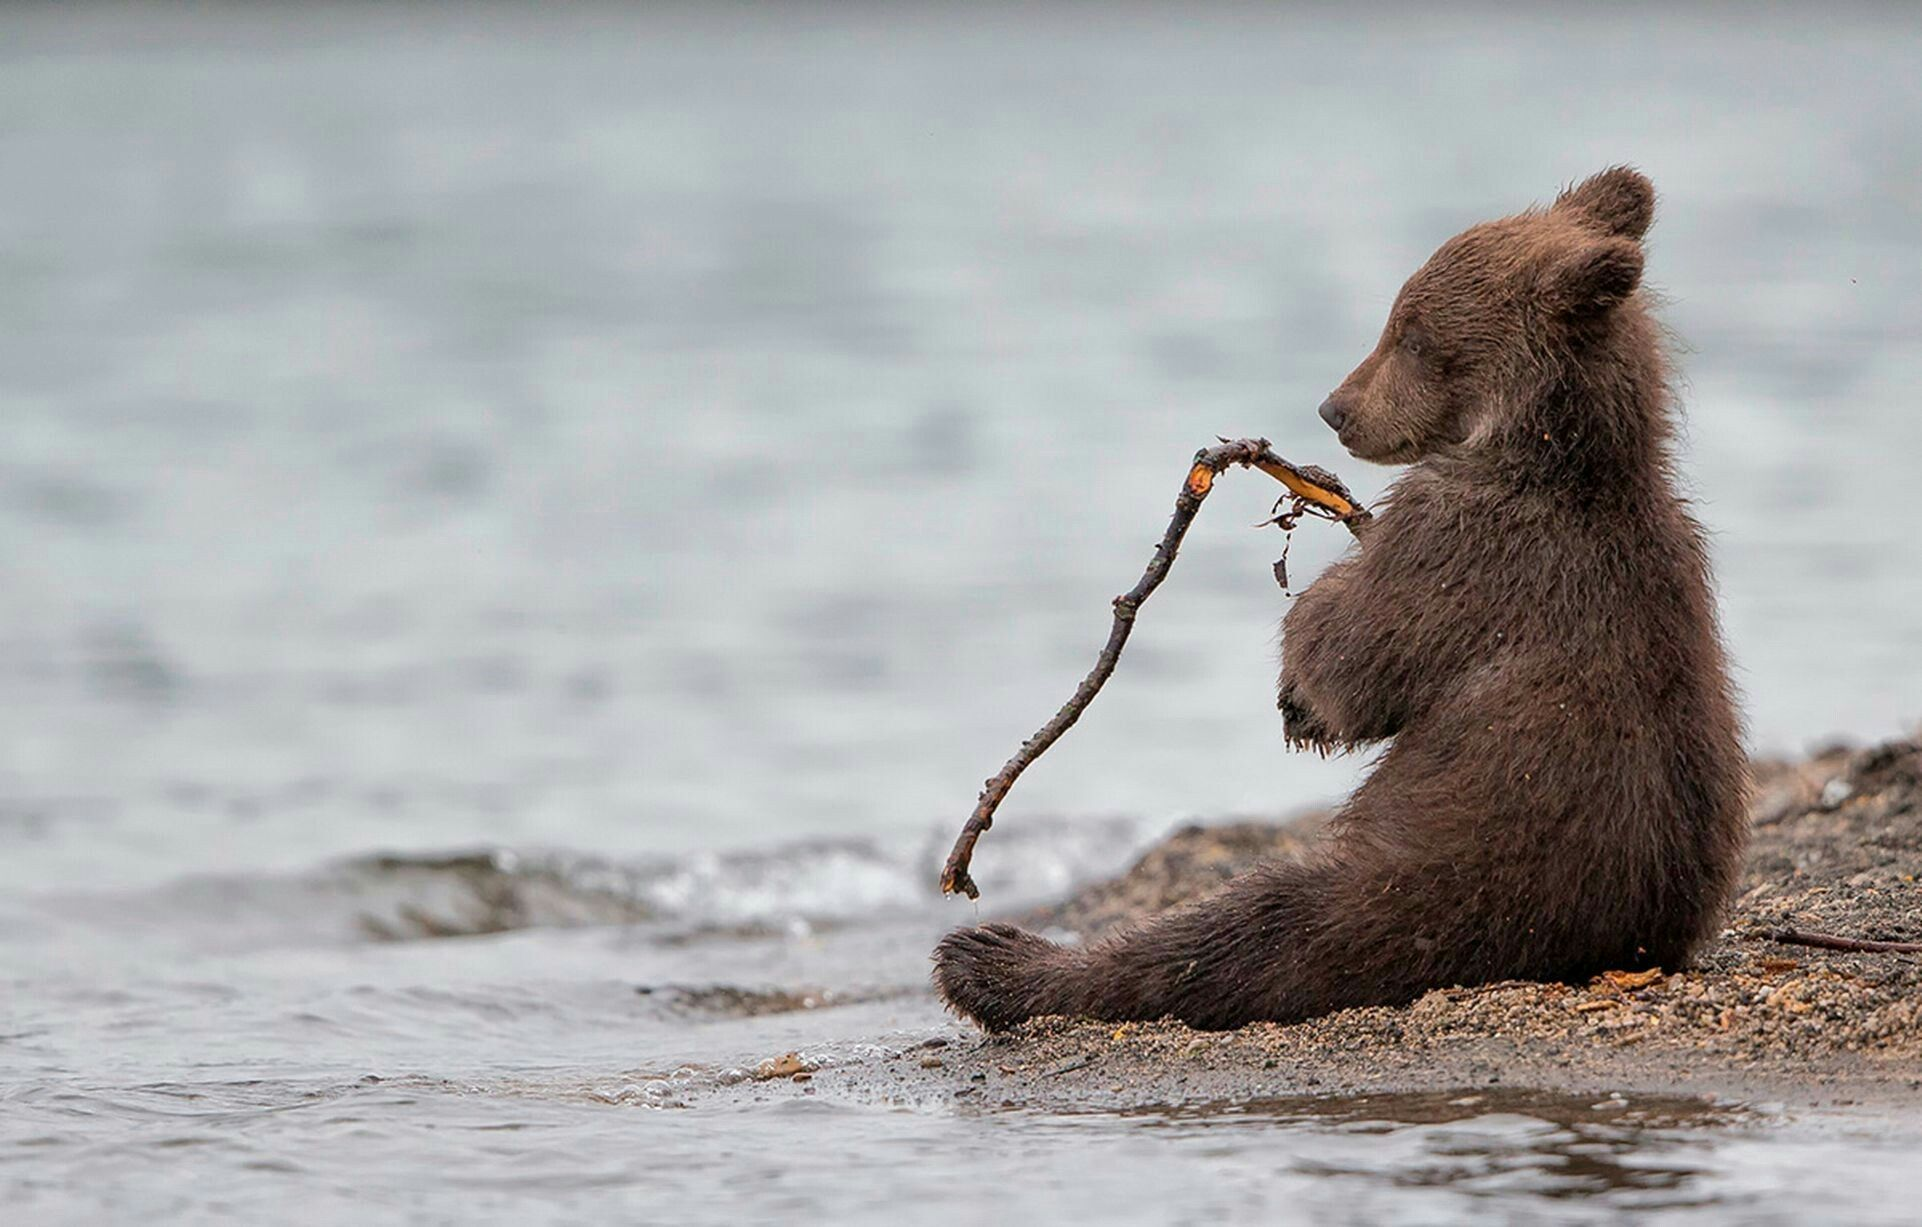 Aww, looks like he was fishing and his pole broke #bears